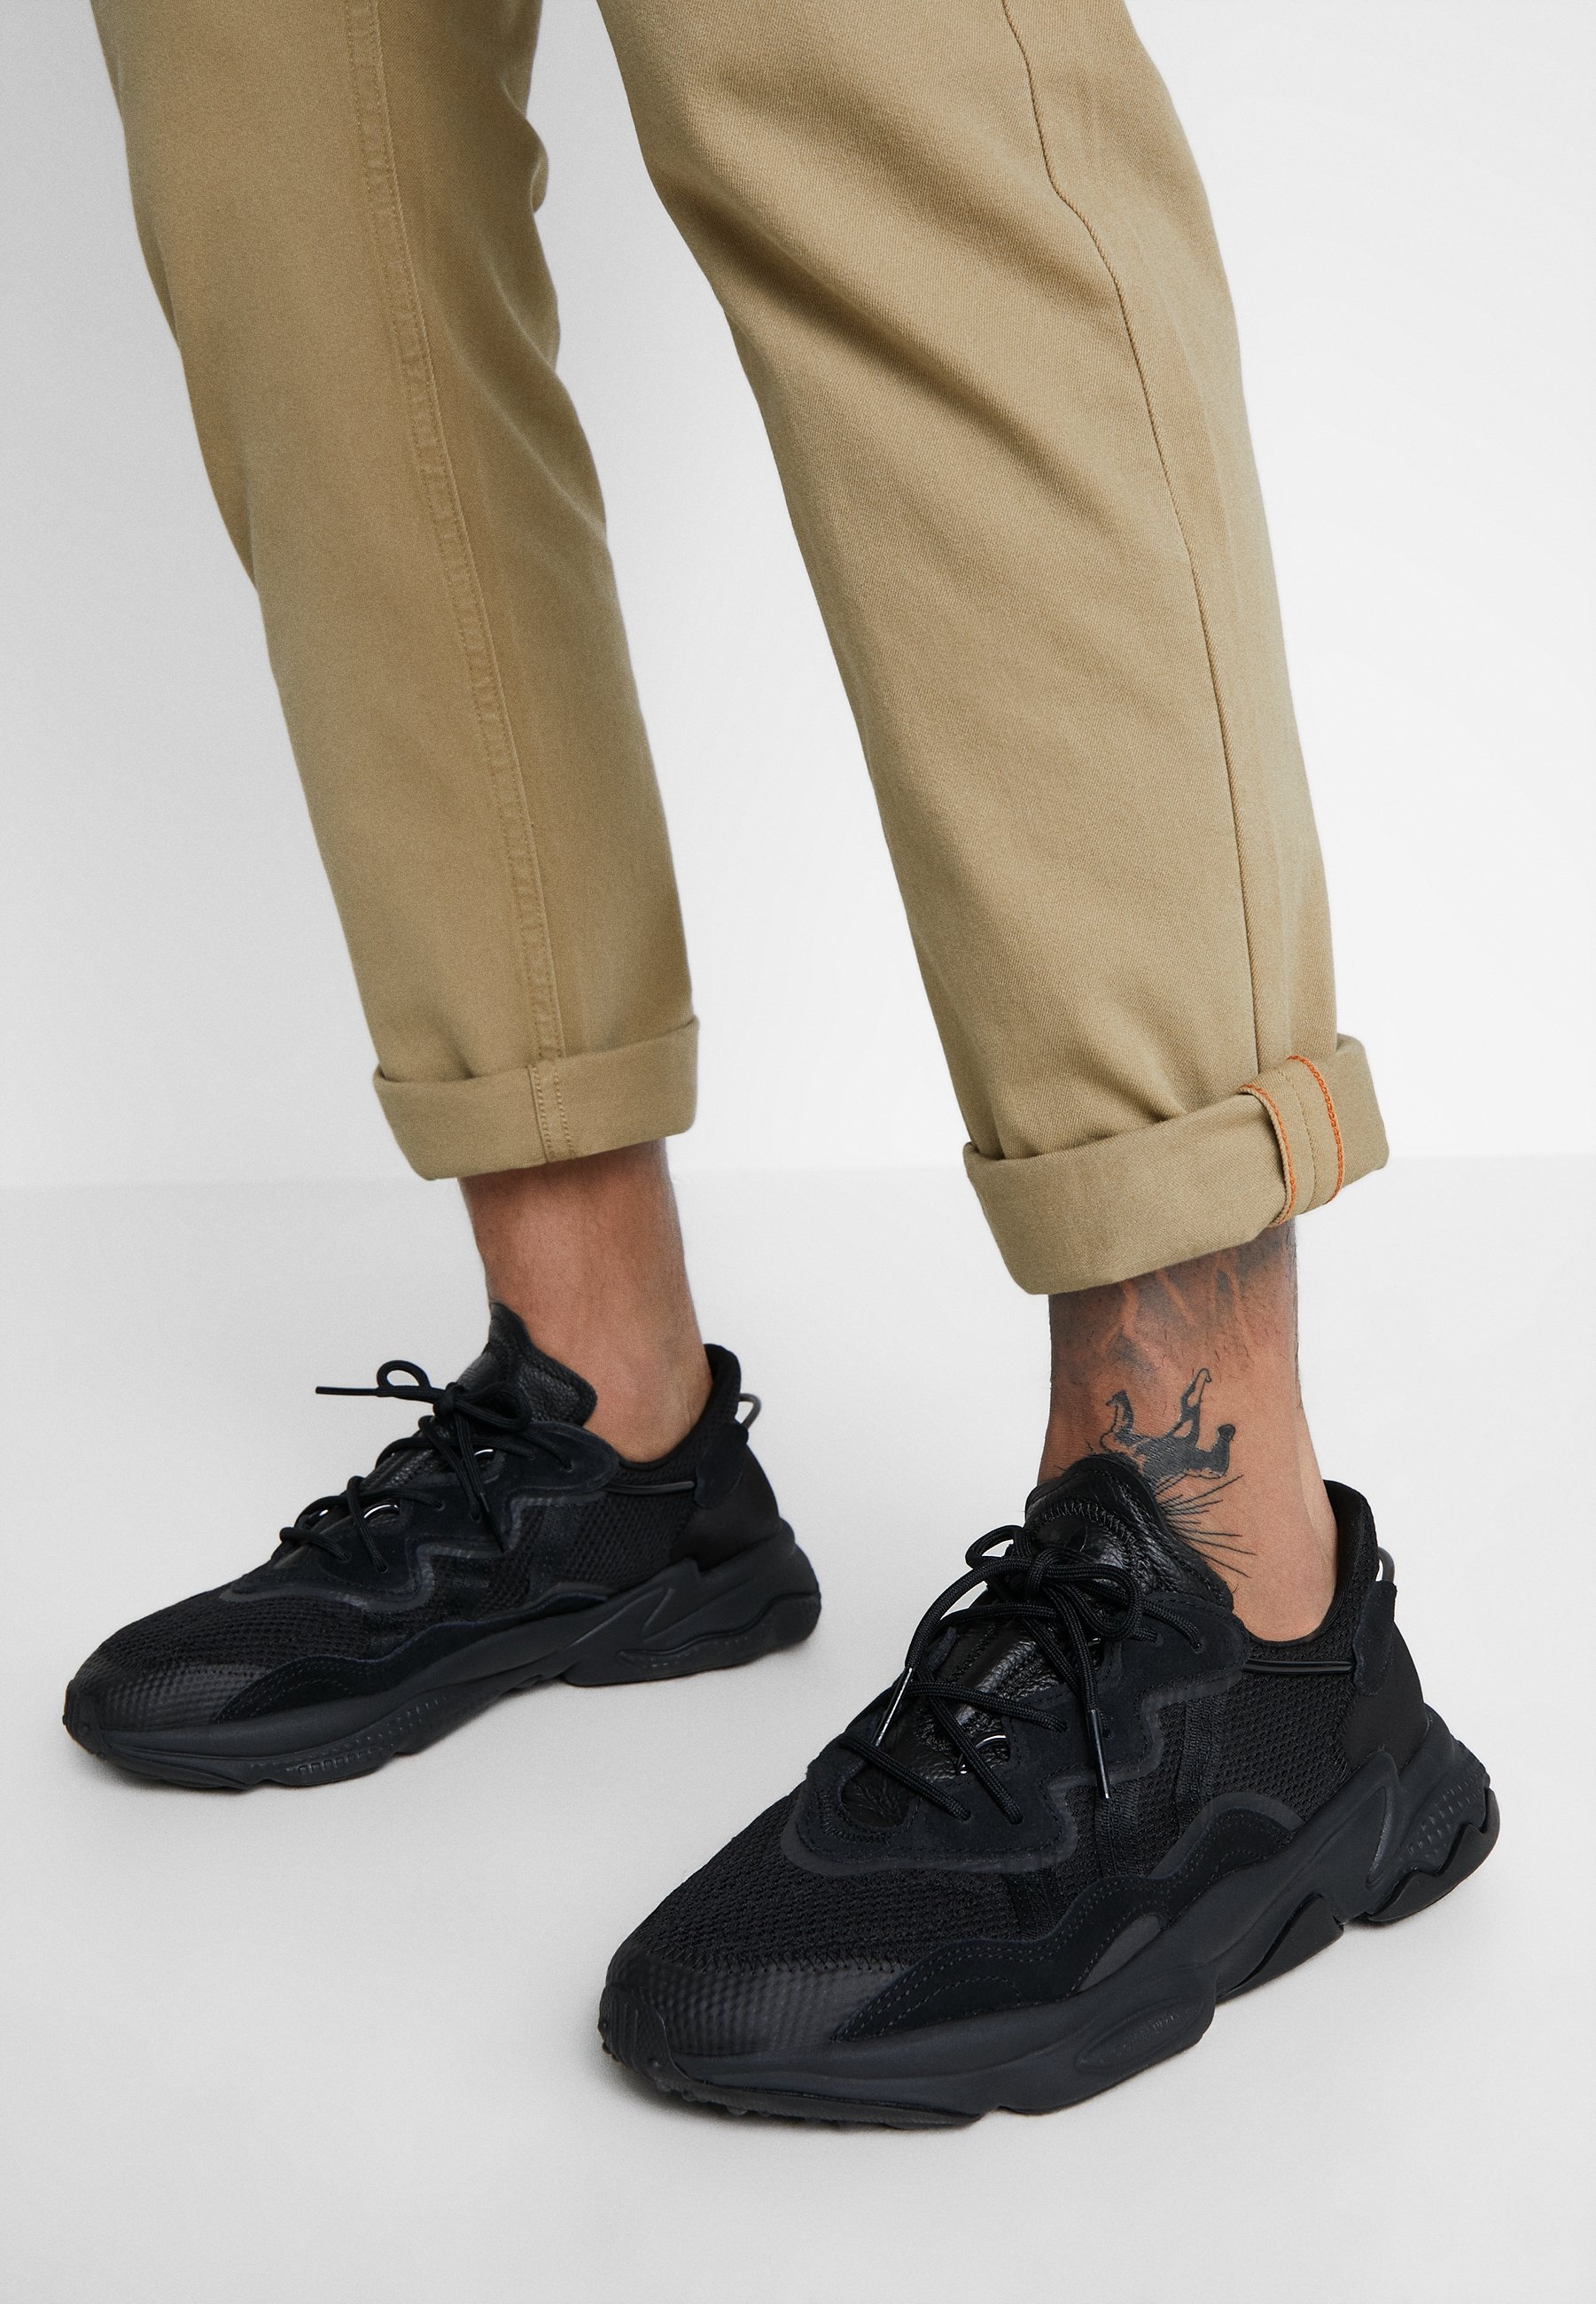 adidas originals ozweego leather